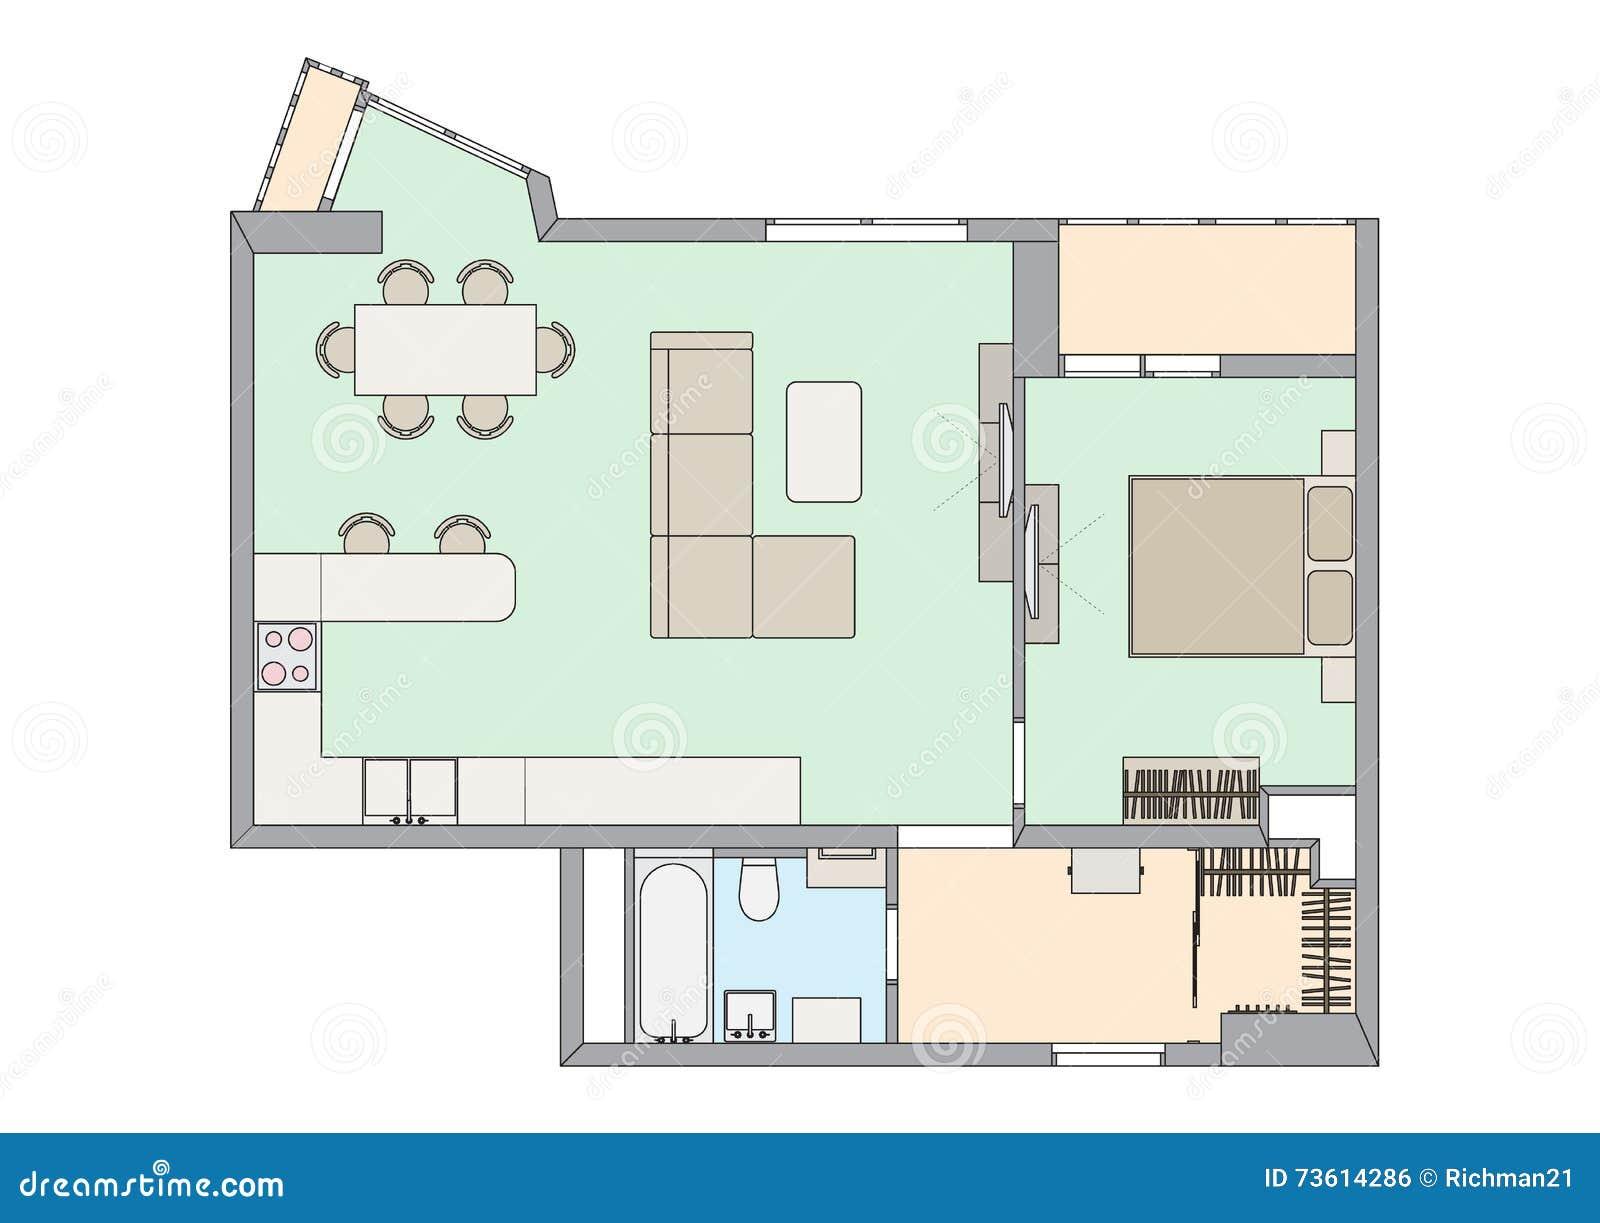 Plan One Bedroom Apartment Stock Vector Illustration Of Bathroom 73614286